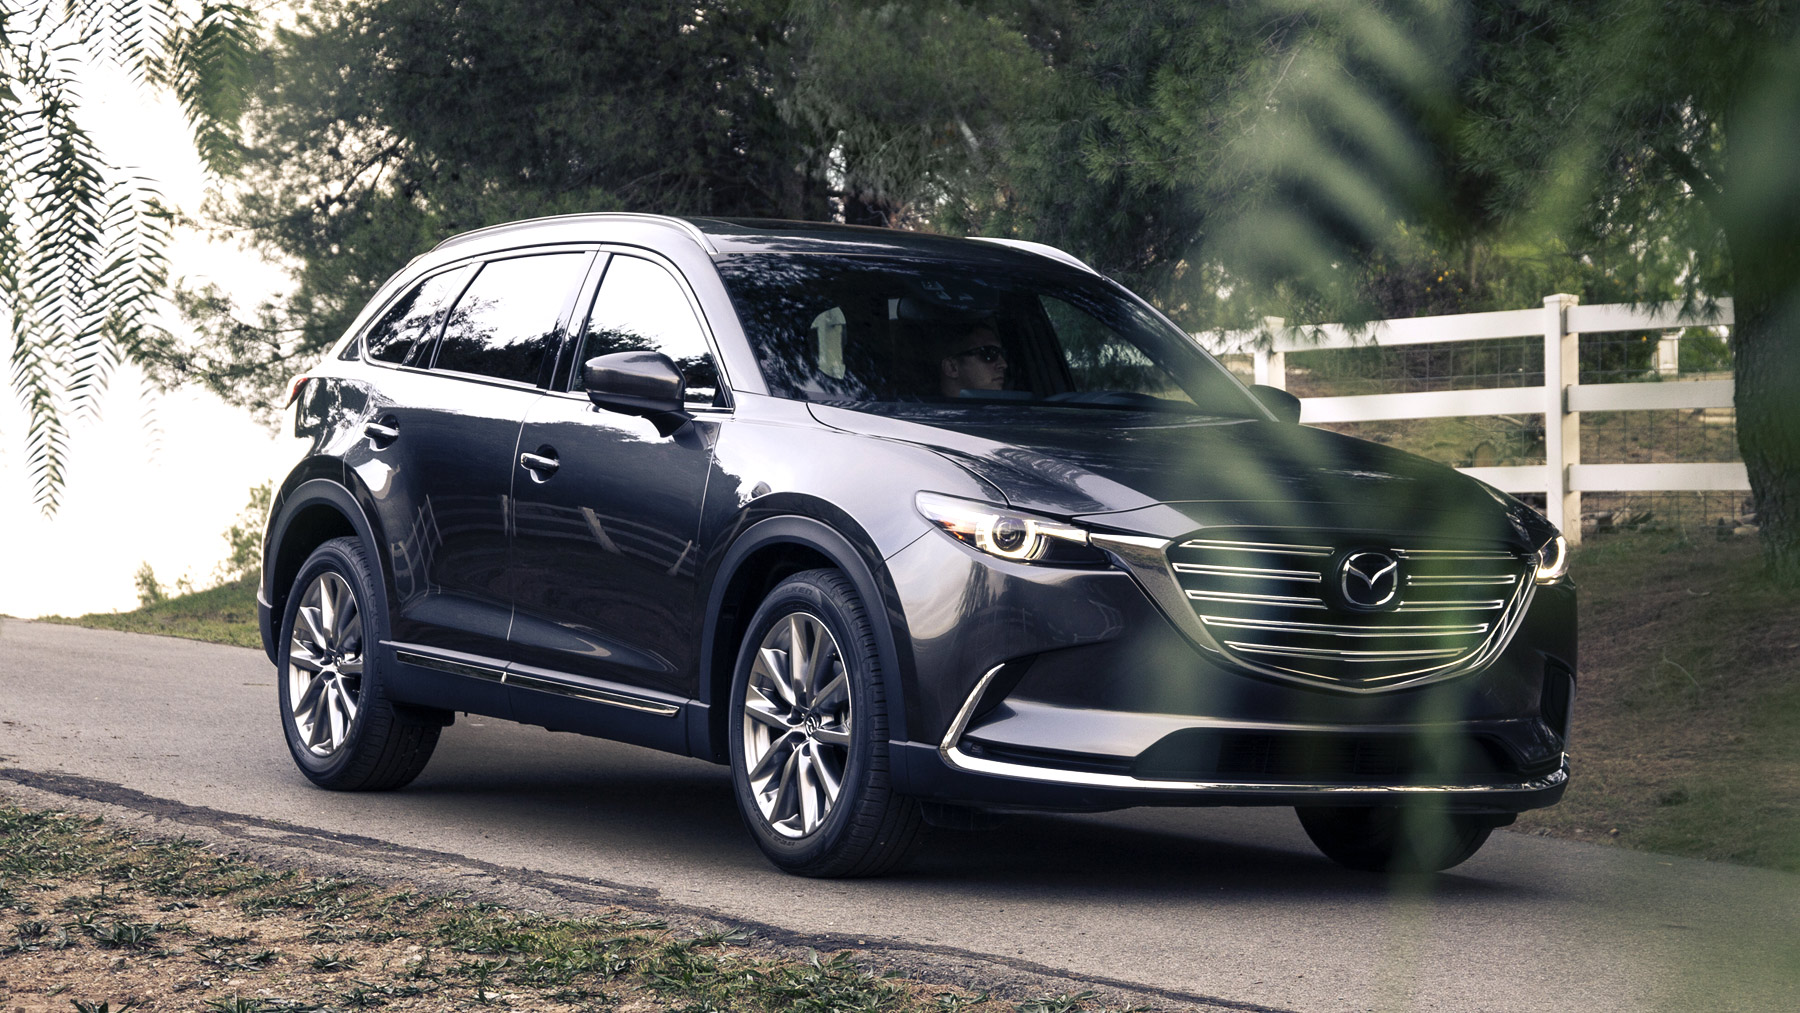 2017 Mazda CX-9 3 Row SUV - Pictures & Videos